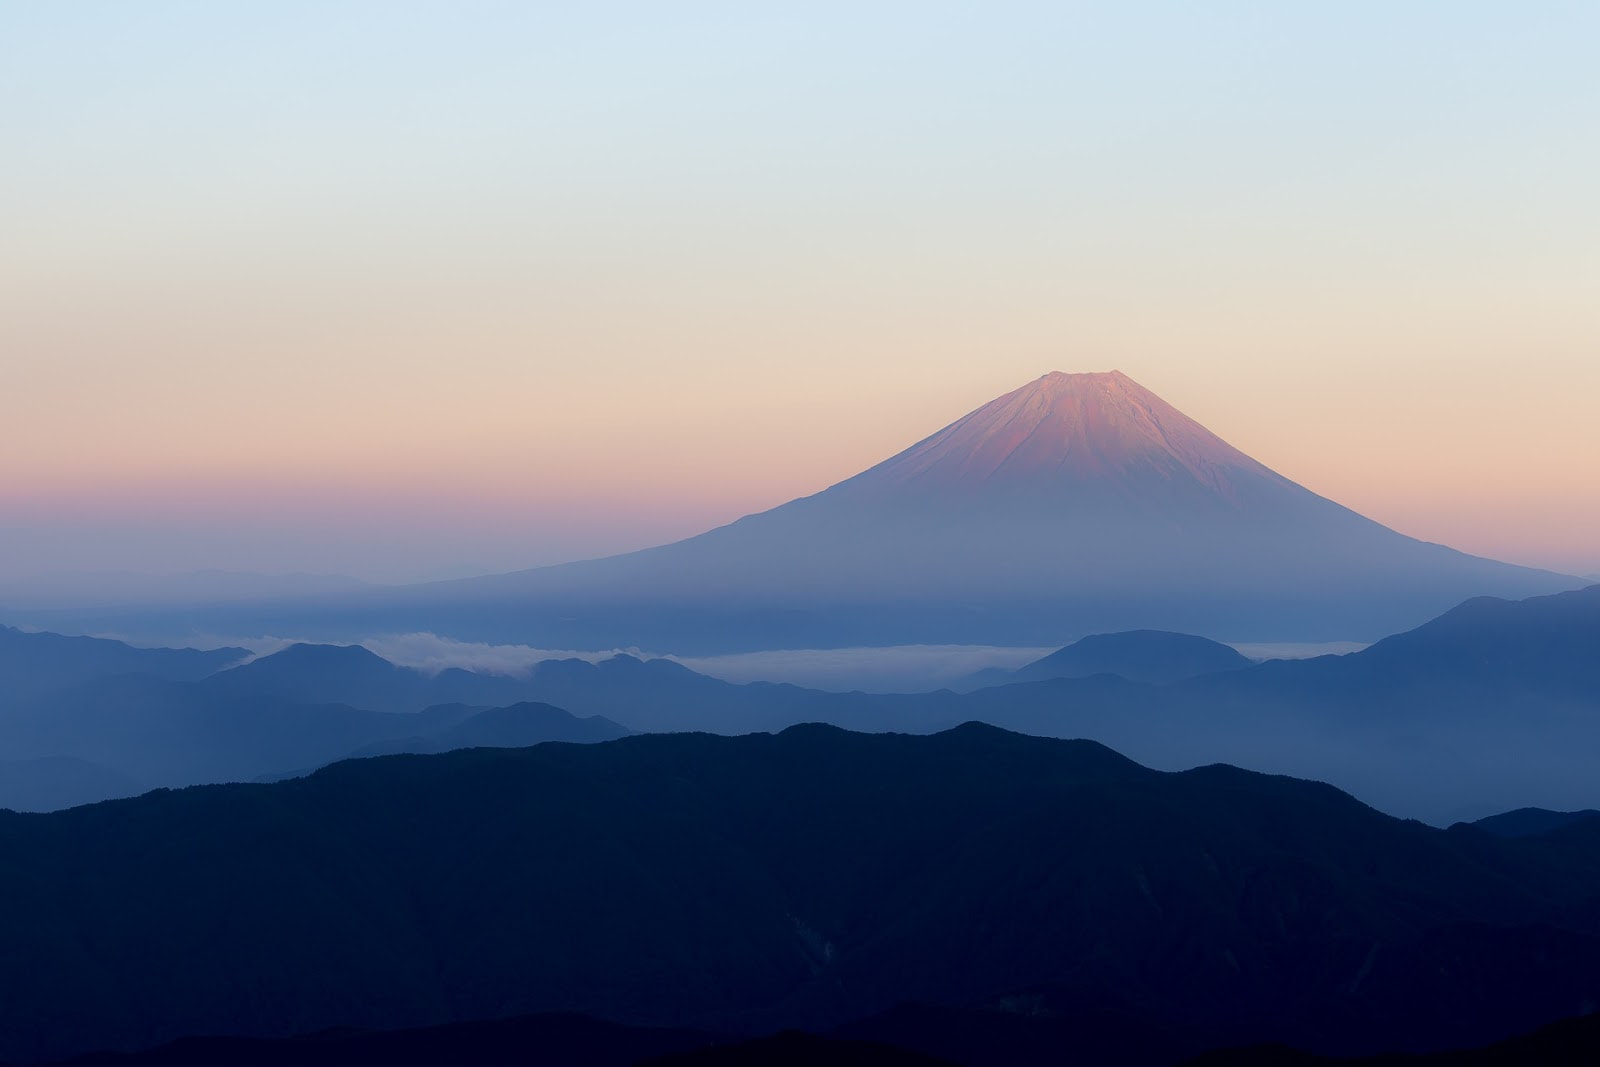 Mount Fuji, Japan2